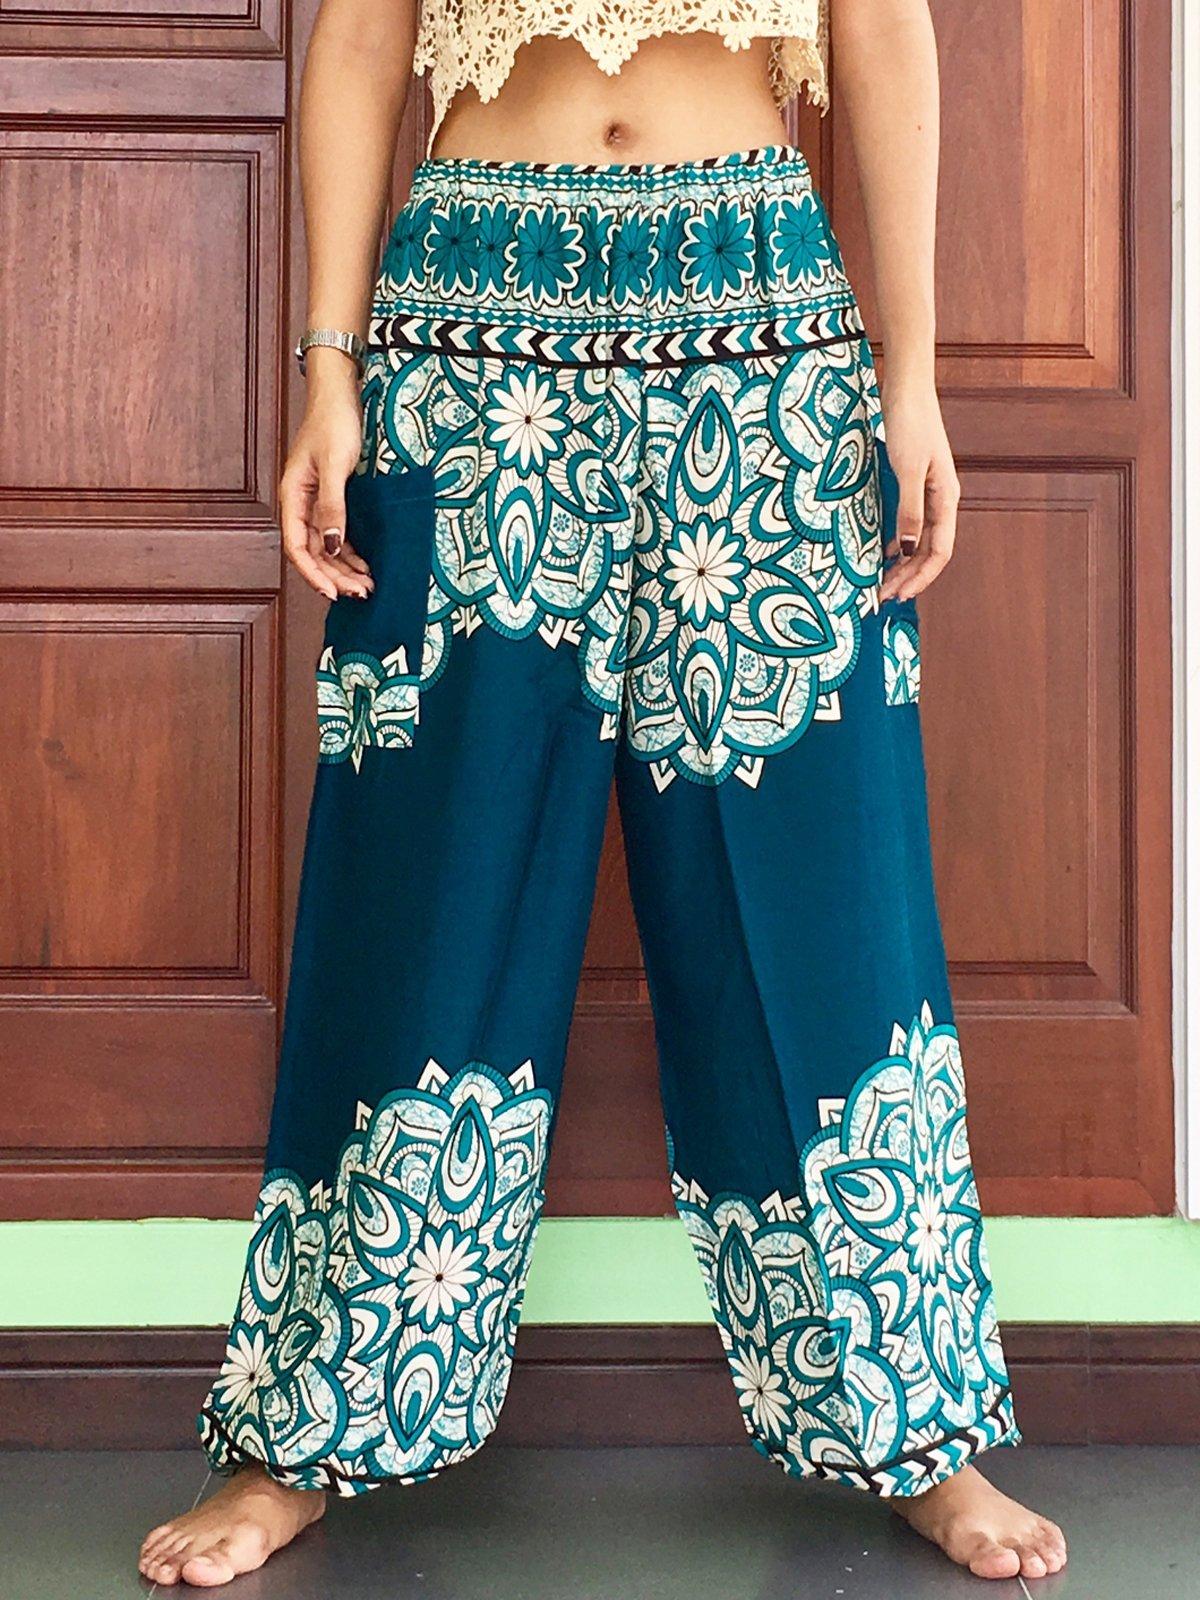 cbb7a98dfb08 Turquoise mens yoga pants 8. Turquoise mens yoga pants 8. Plus Size Mens  Casual Turquoise lightweight summer trousers womens Harem ...